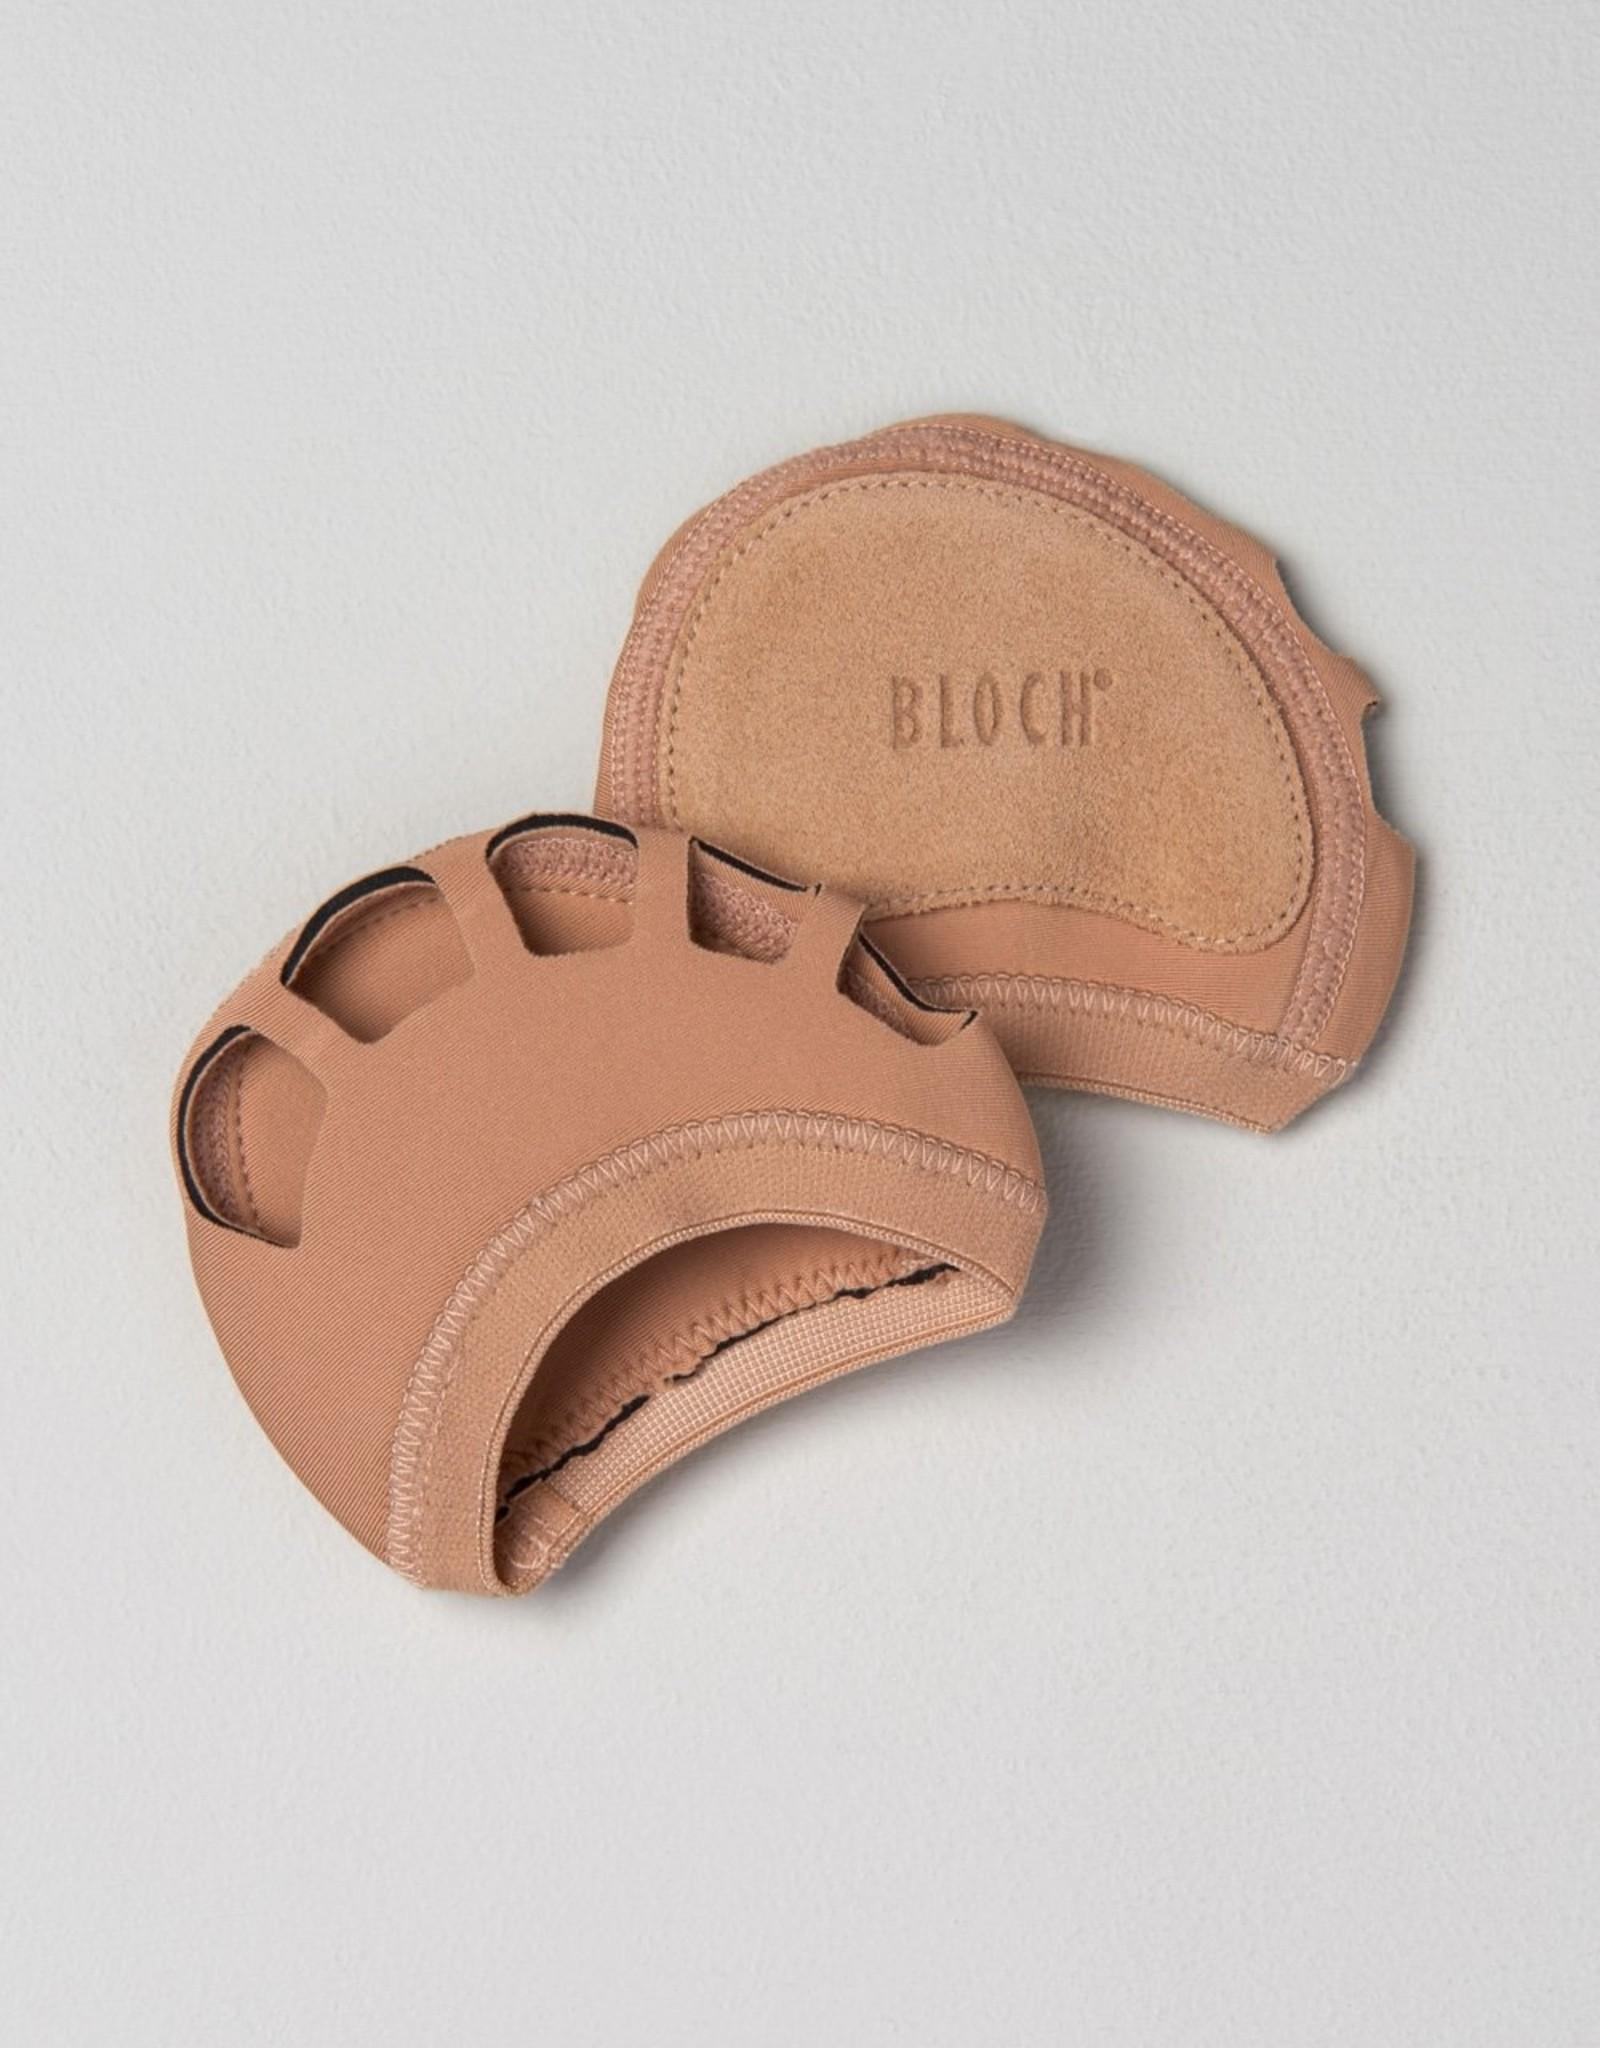 Bloch Bloch Neoprene Footform S0642